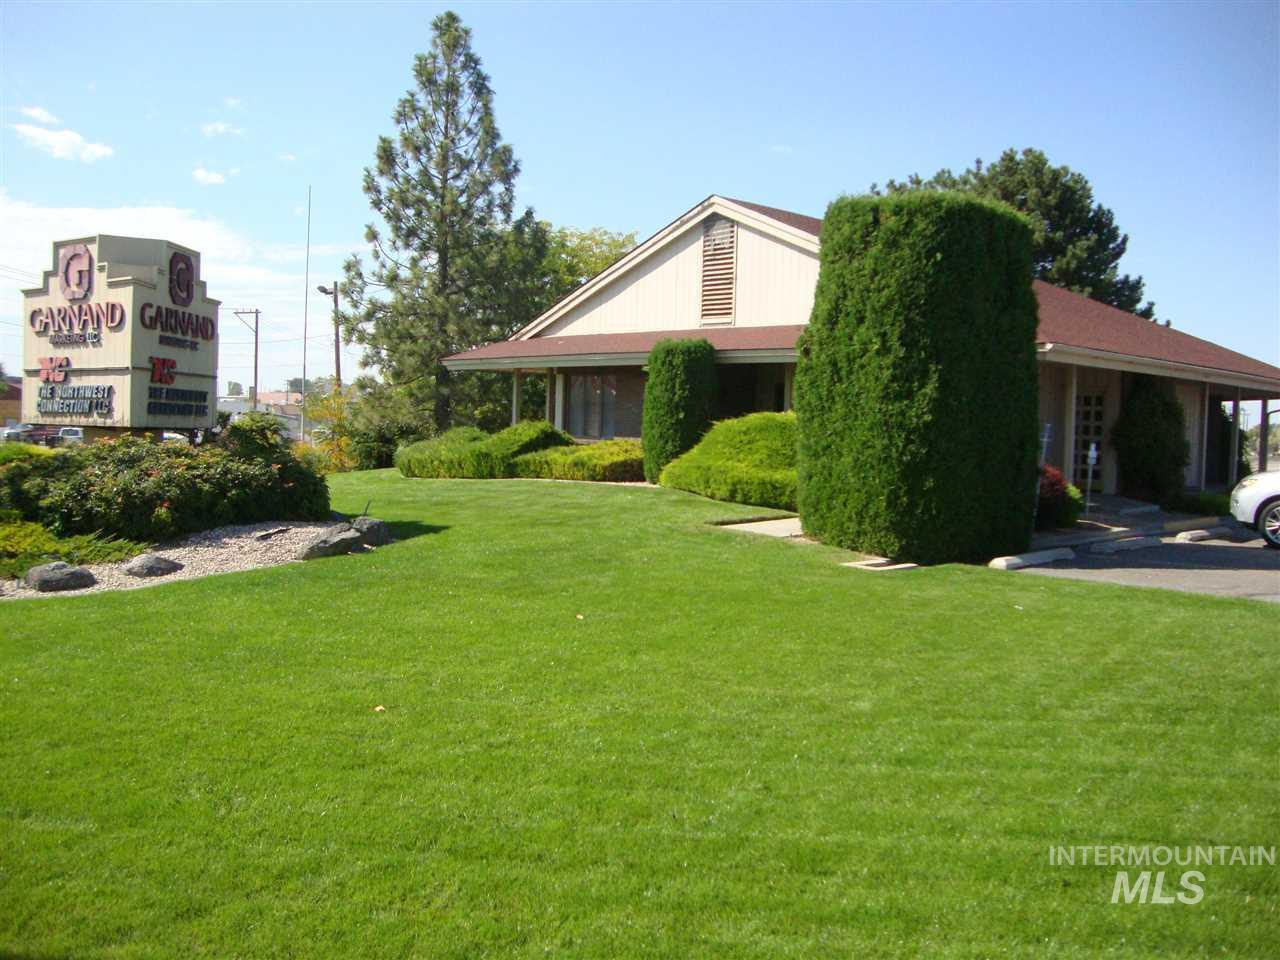 129 Eastland Dr.,Twin Falls,Idaho 83301,Business/Commercial,129 Eastland Dr.,98671780